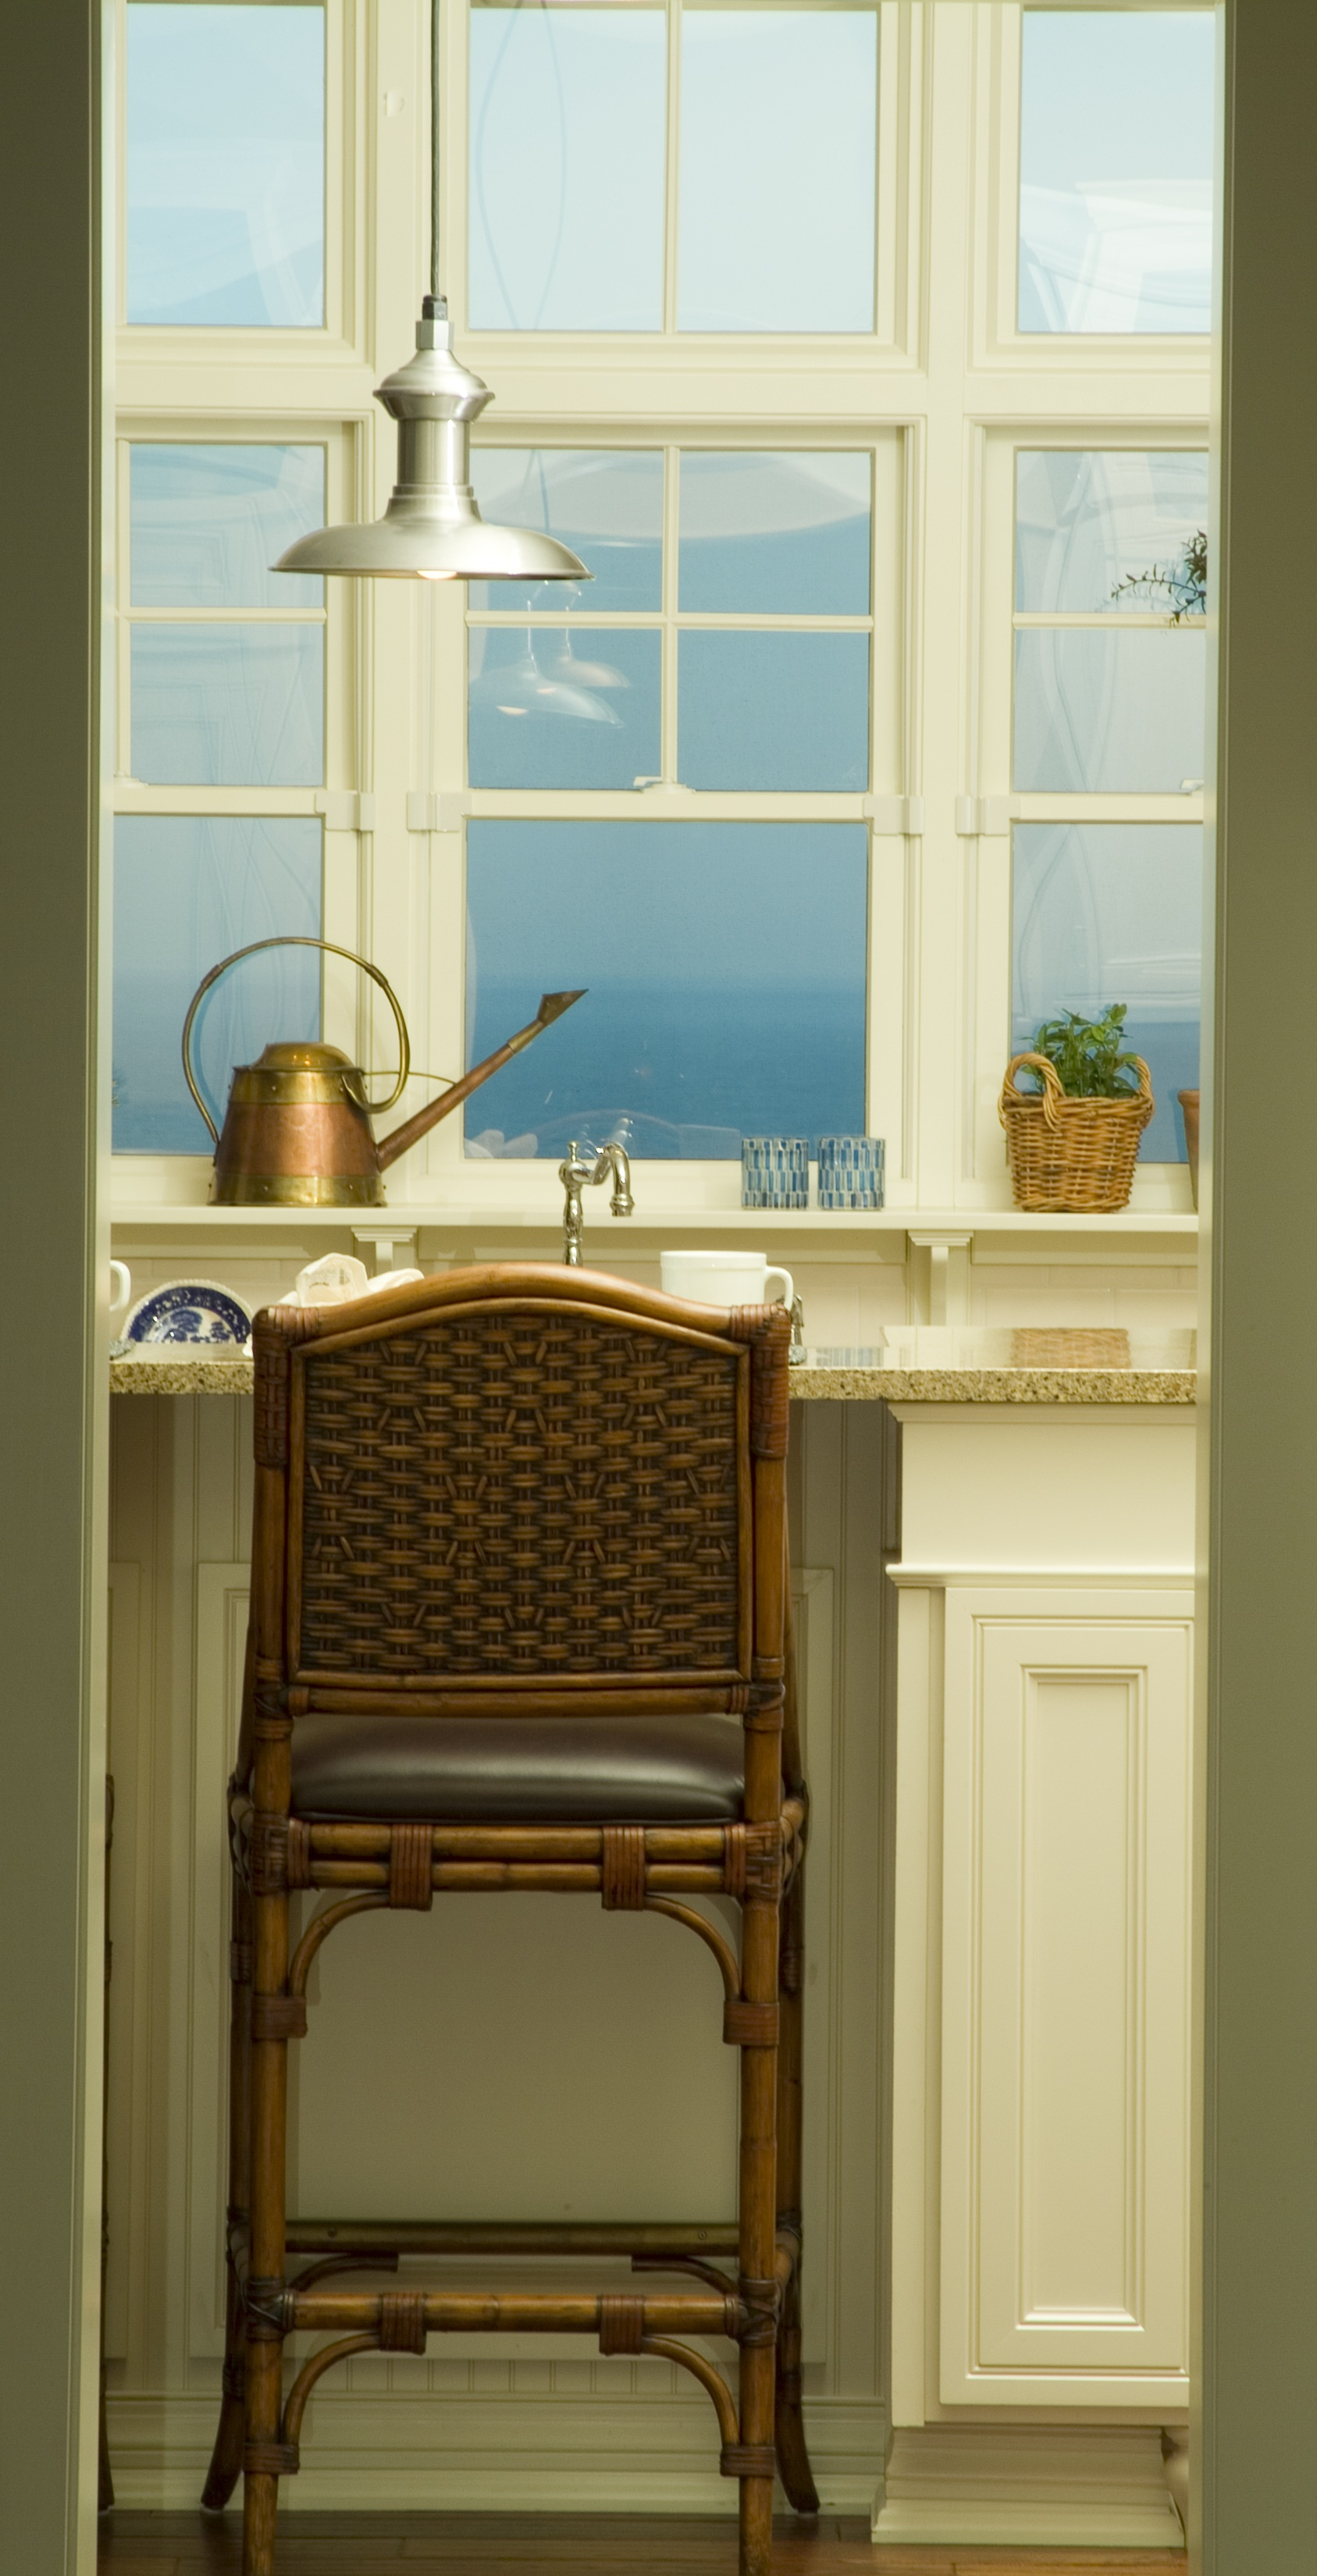 Kitchen1-10.jpeg